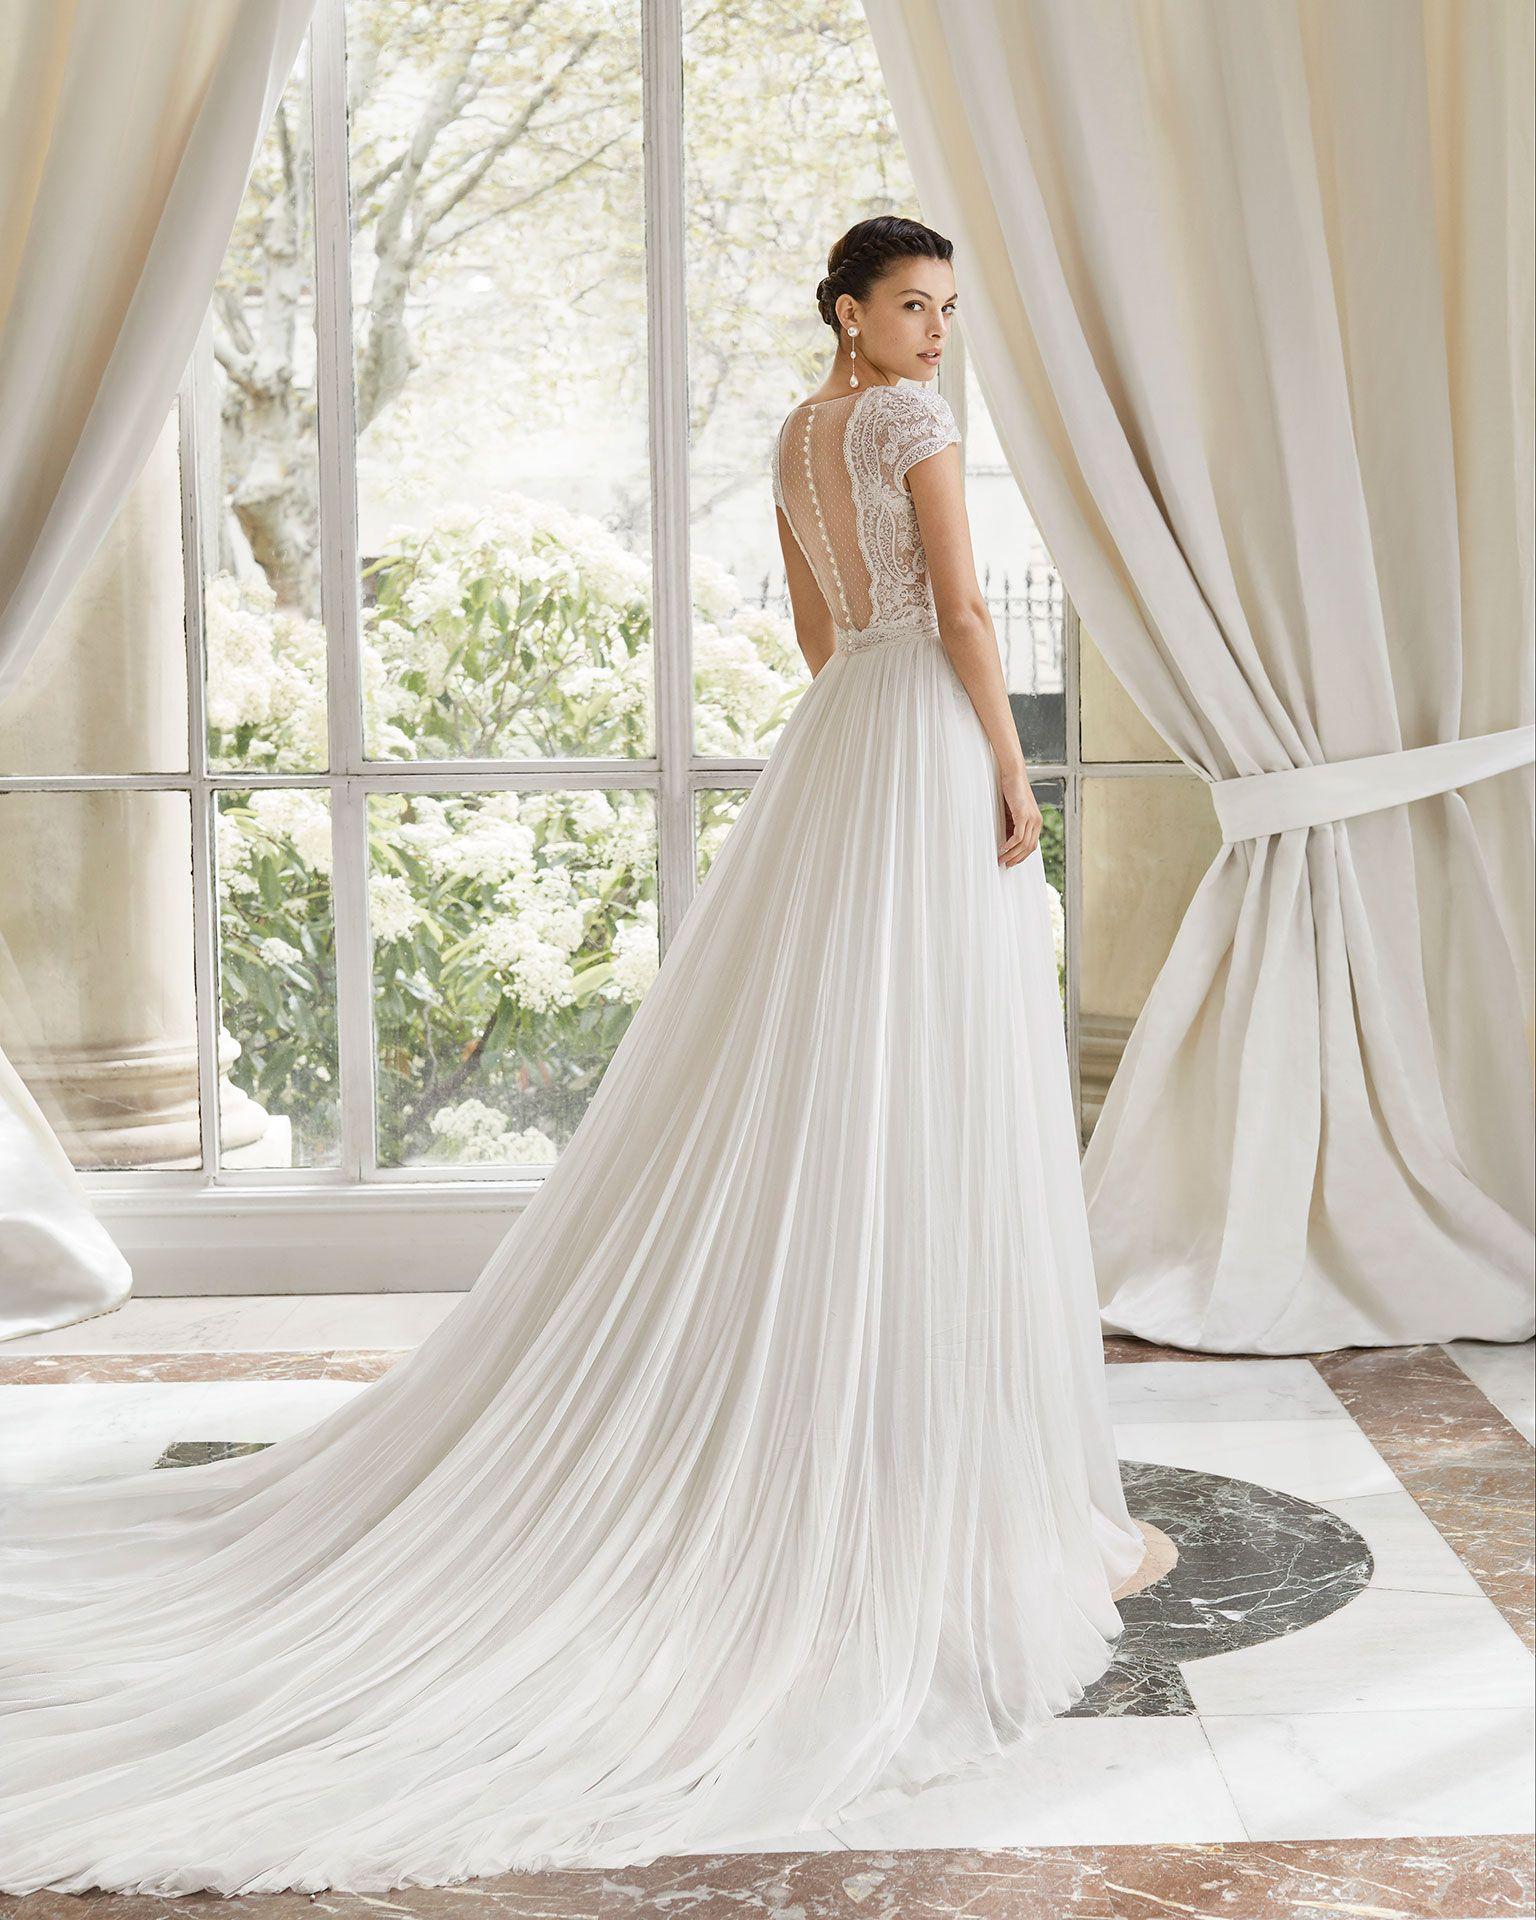 Melisa Bridal 2019 Rosa Clara Couture Collection Wedding